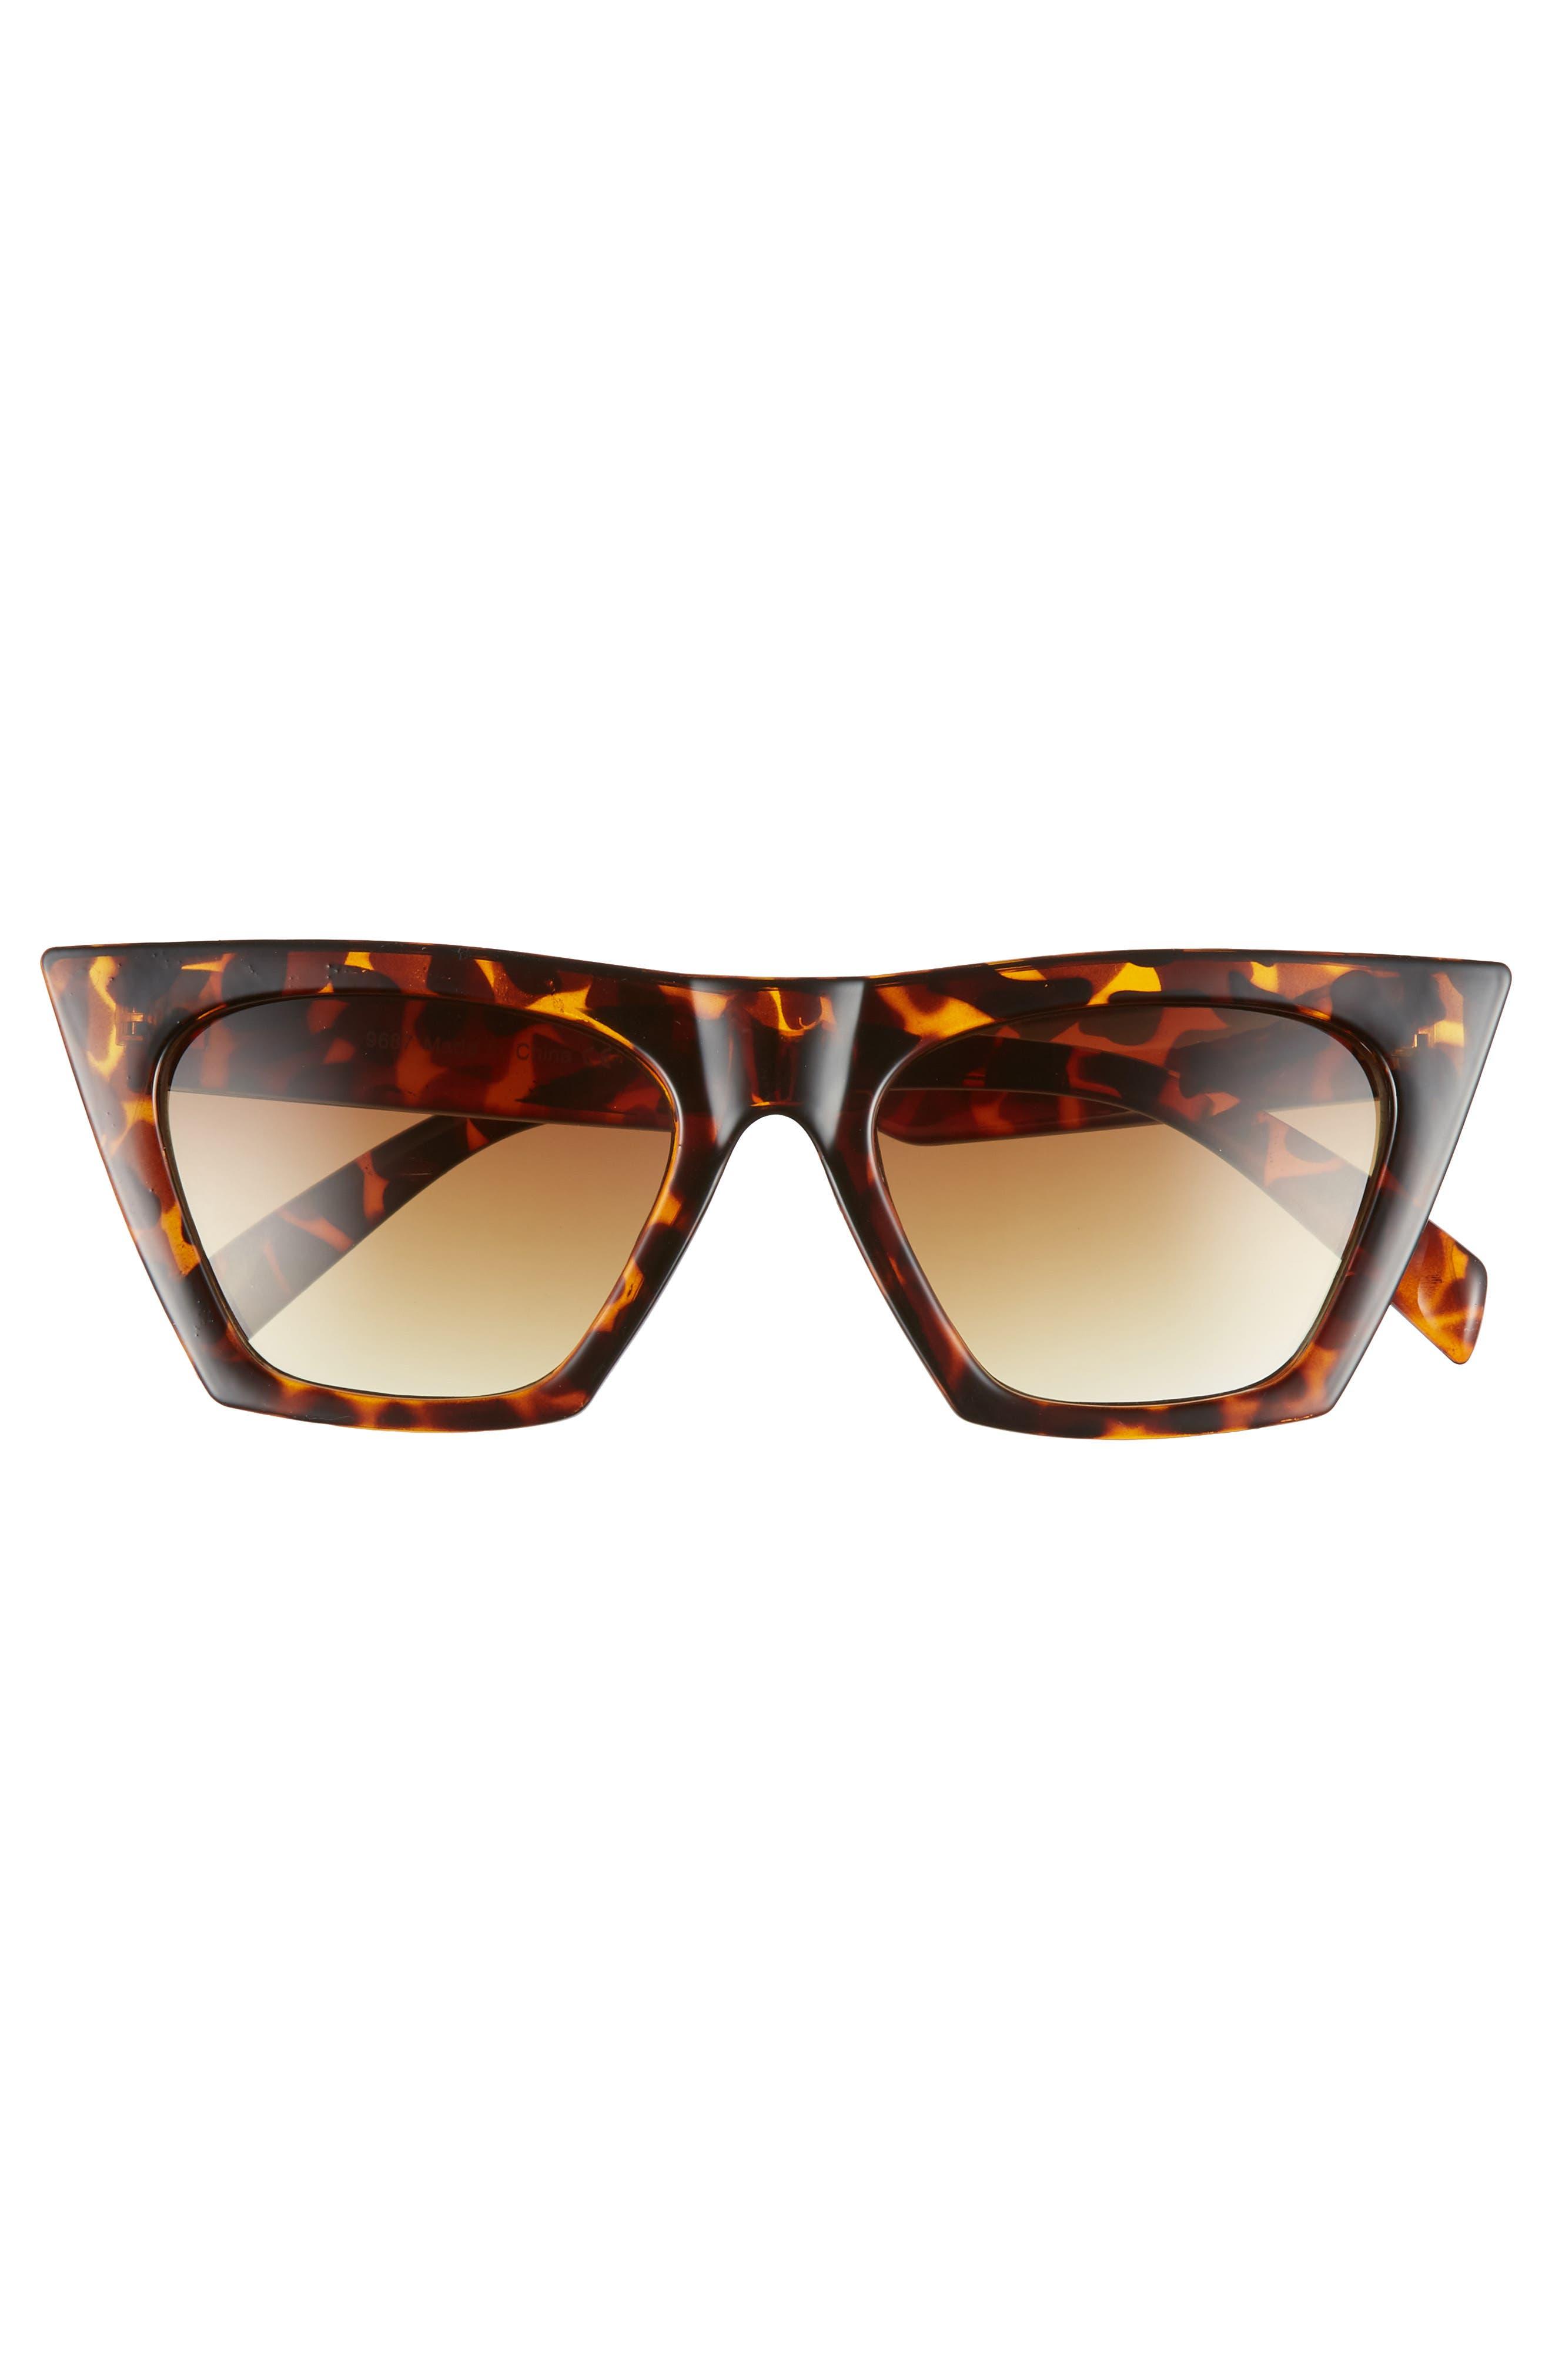 50mm Cat Eye Sunglasses,                             Alternate thumbnail 3, color,                             BROWN MULTI